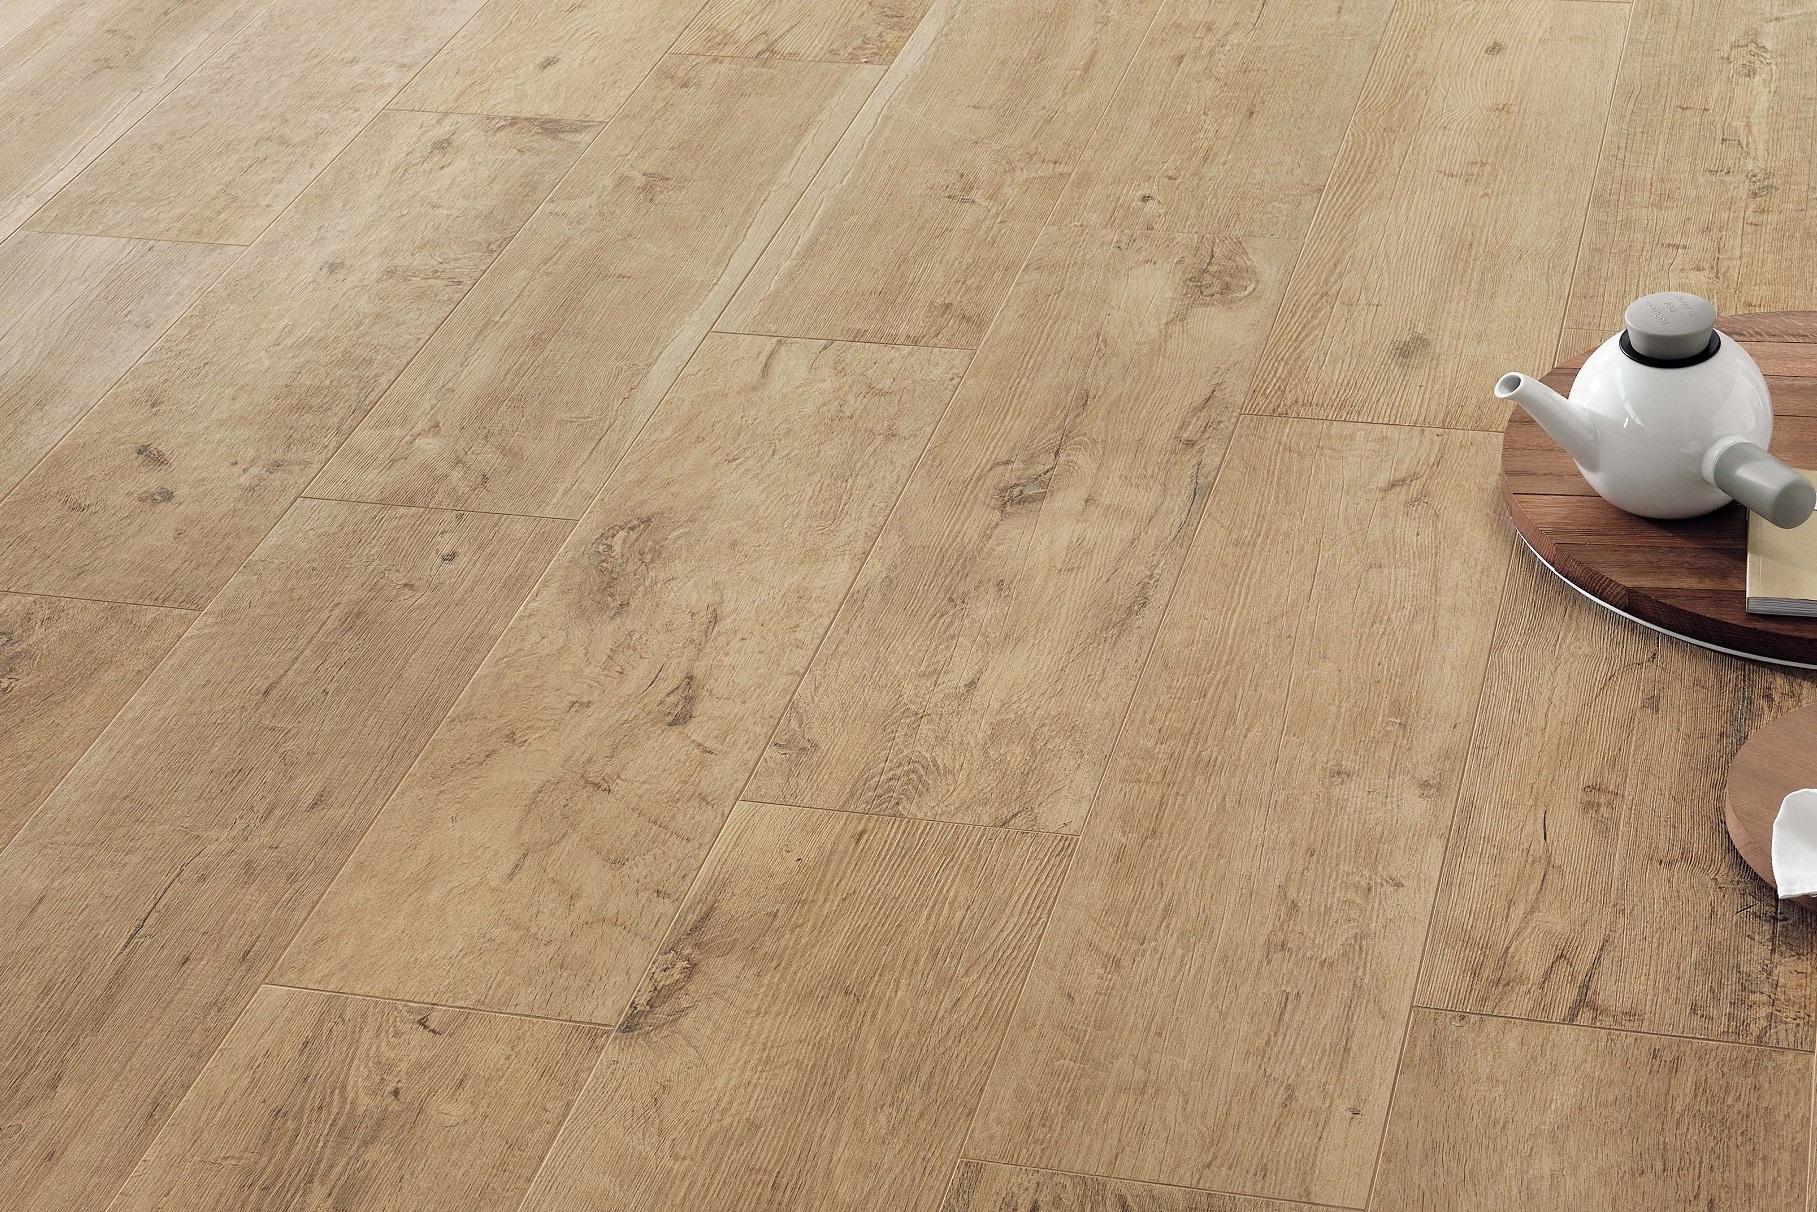 fliesen holzoptik eiche gro format axi golden oak. Black Bedroom Furniture Sets. Home Design Ideas